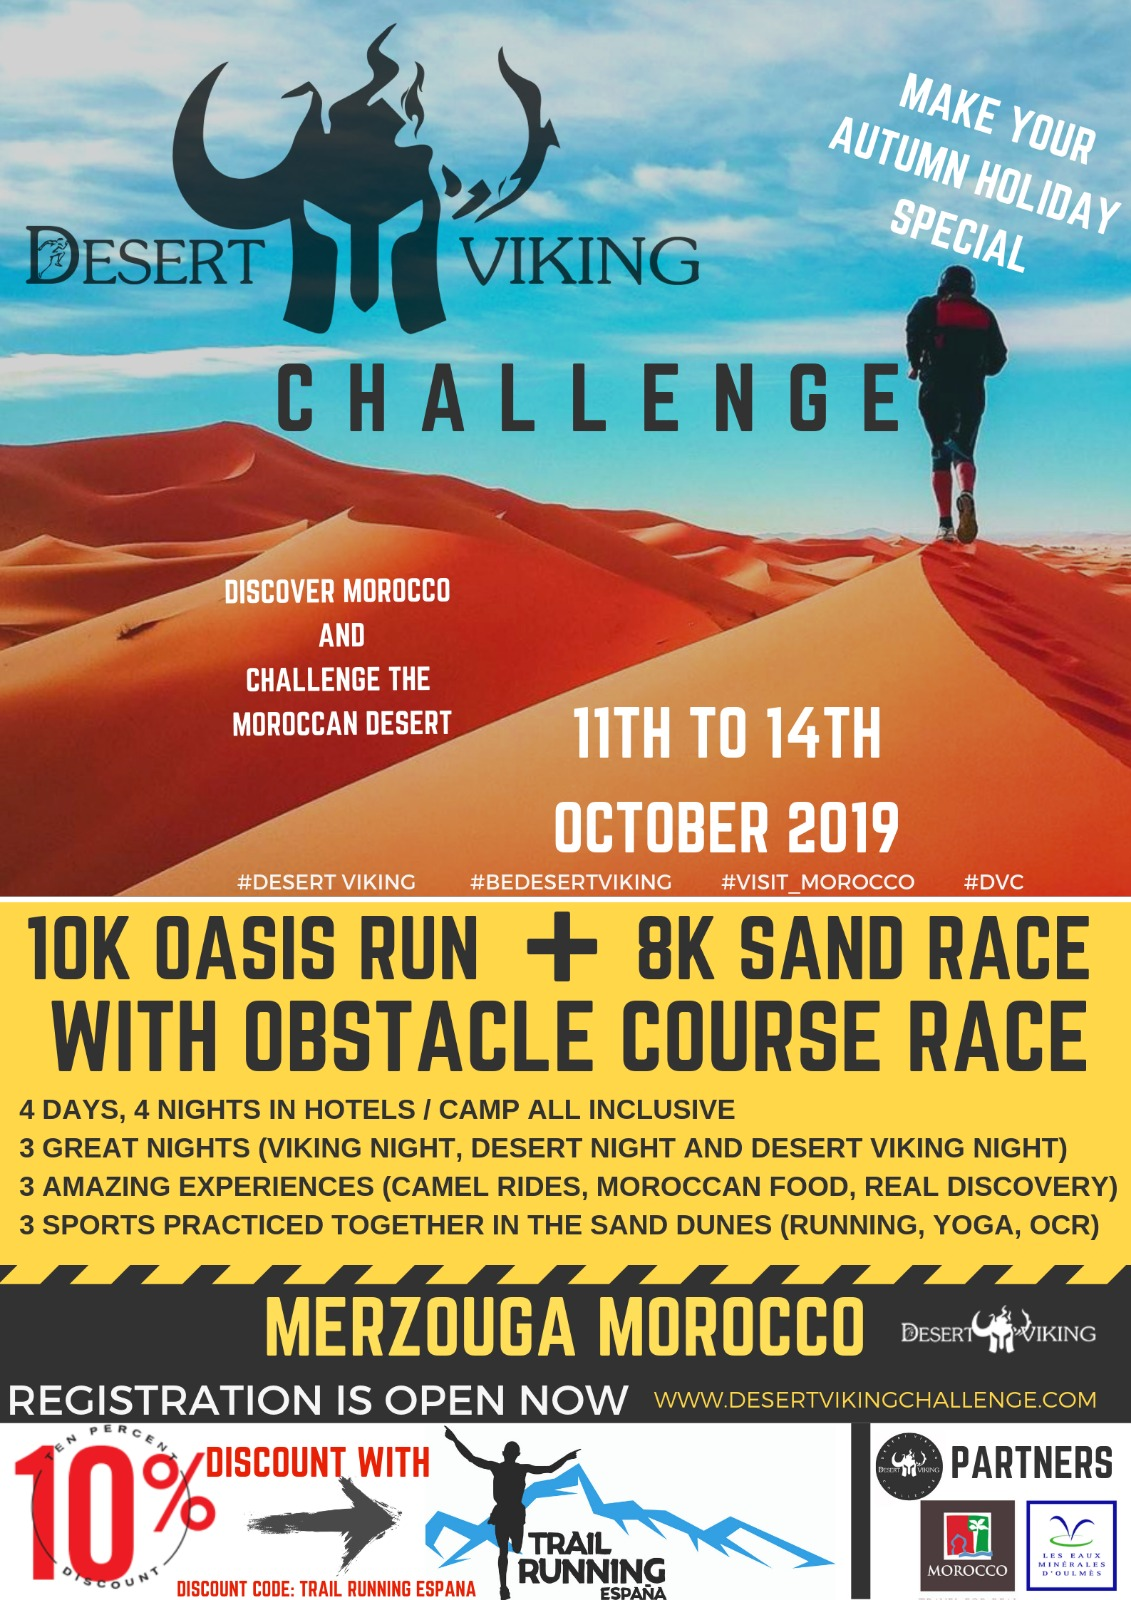 II Desert Viking Challlenge en Merzouga (Marruecos) - 11 al 14/10/2019